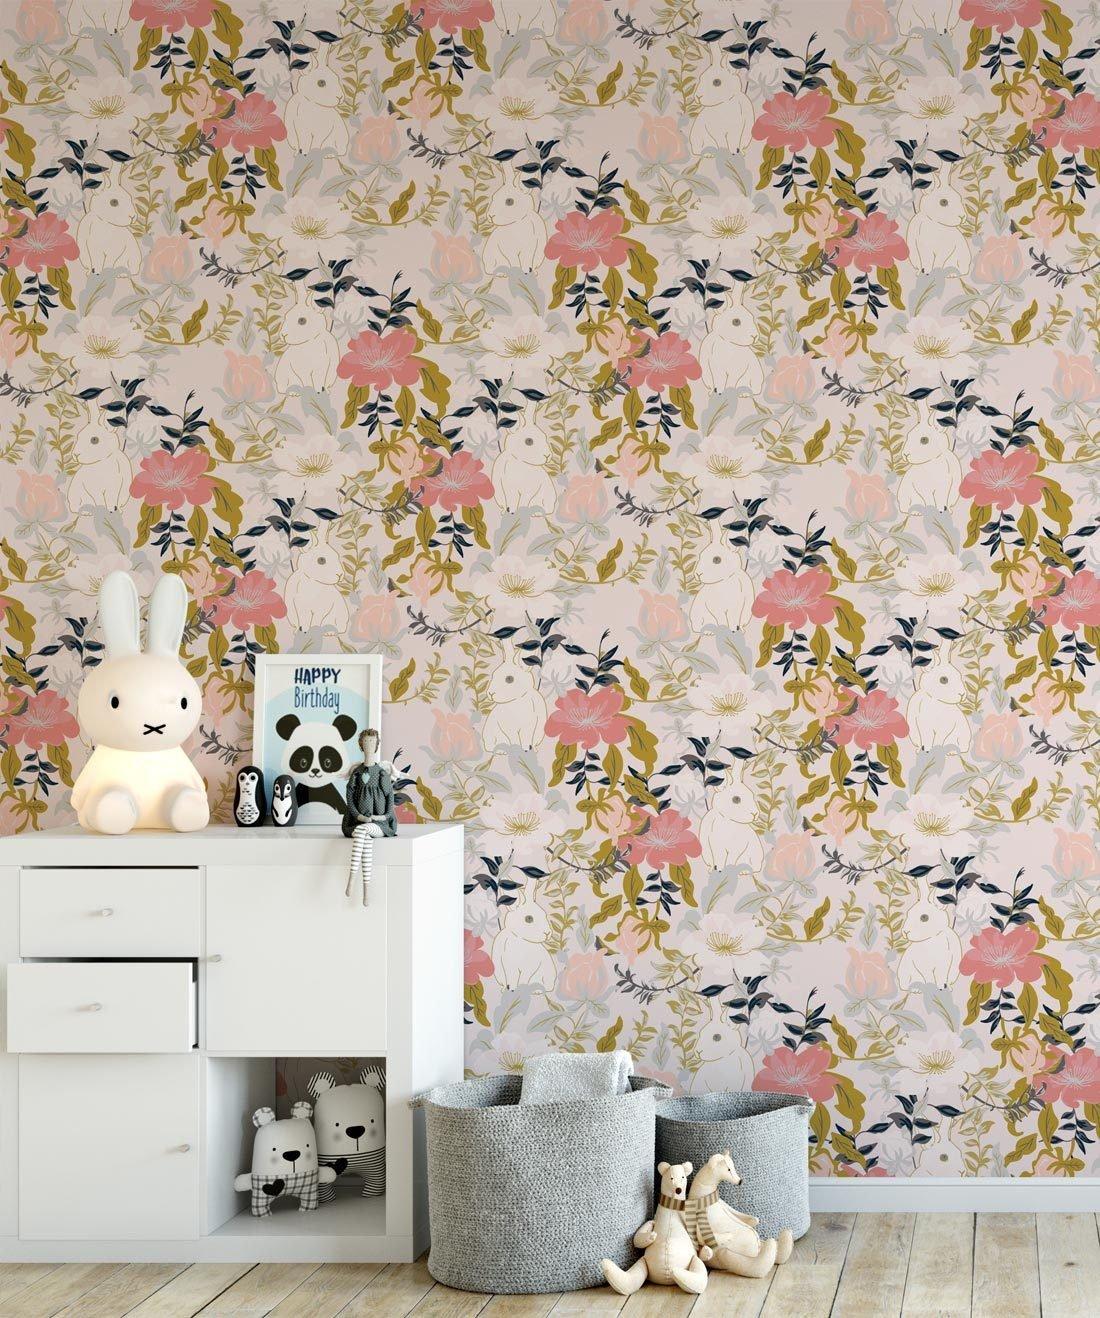 Garden Bunny Wallpaper in Blush from the Wallpaper Republic 1100x1318